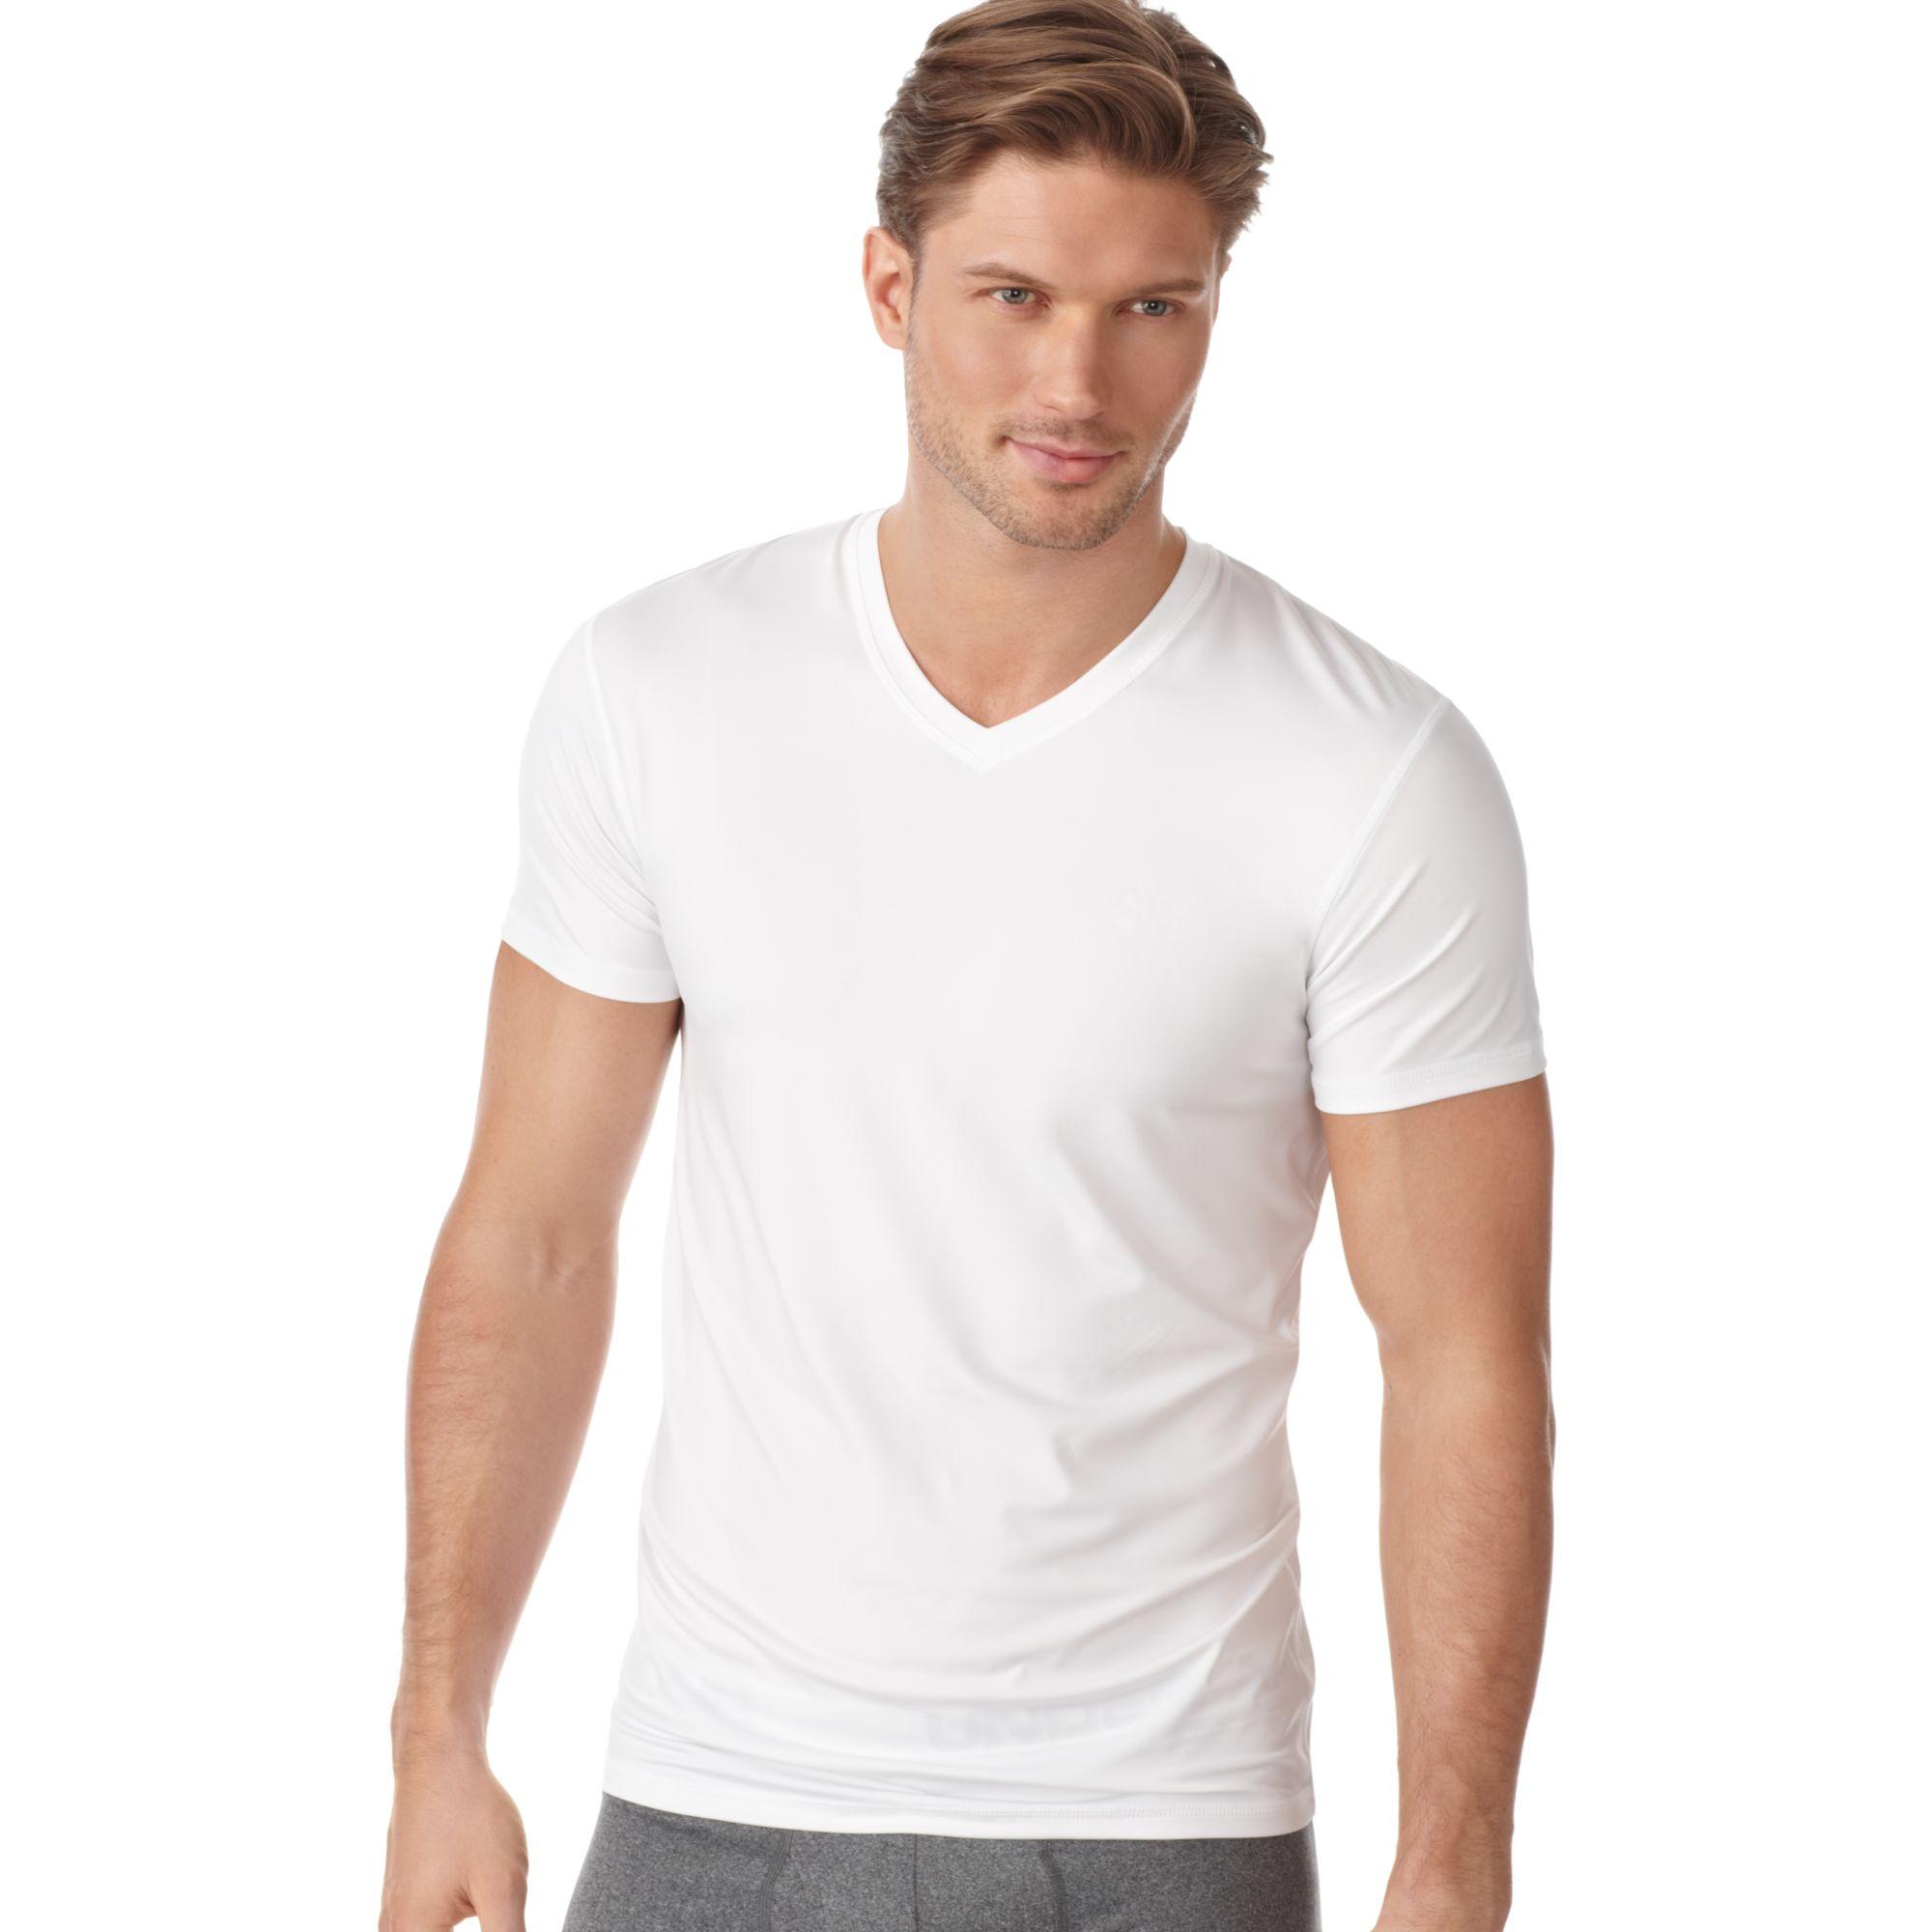 Under armour original series vneck tee in white for men lyst for Original under armour shirt